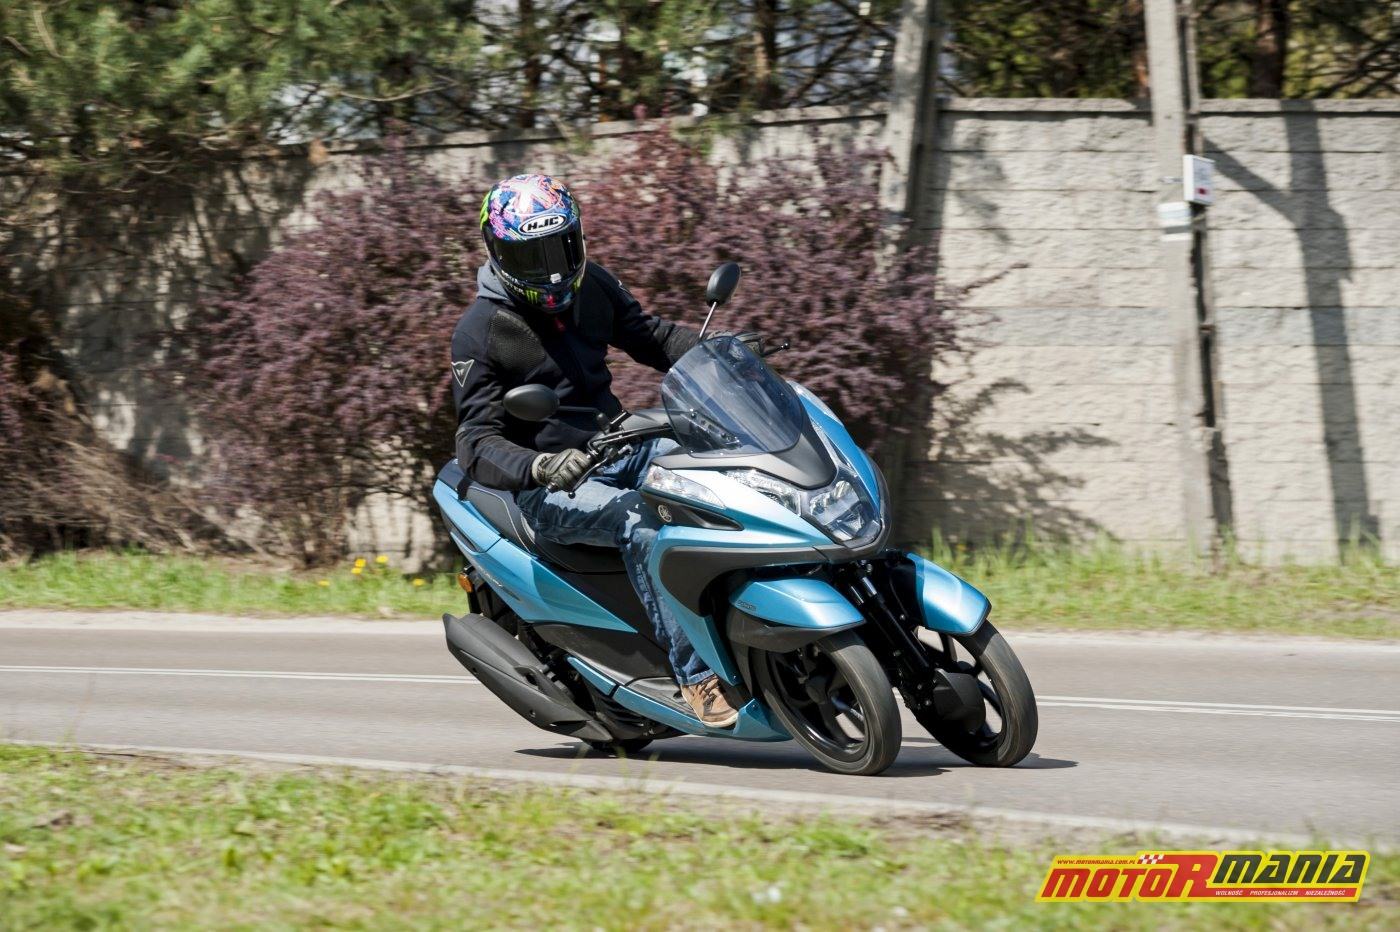 Yamaha Tricity 125 test motormania - fot Tomazi_pl (17)